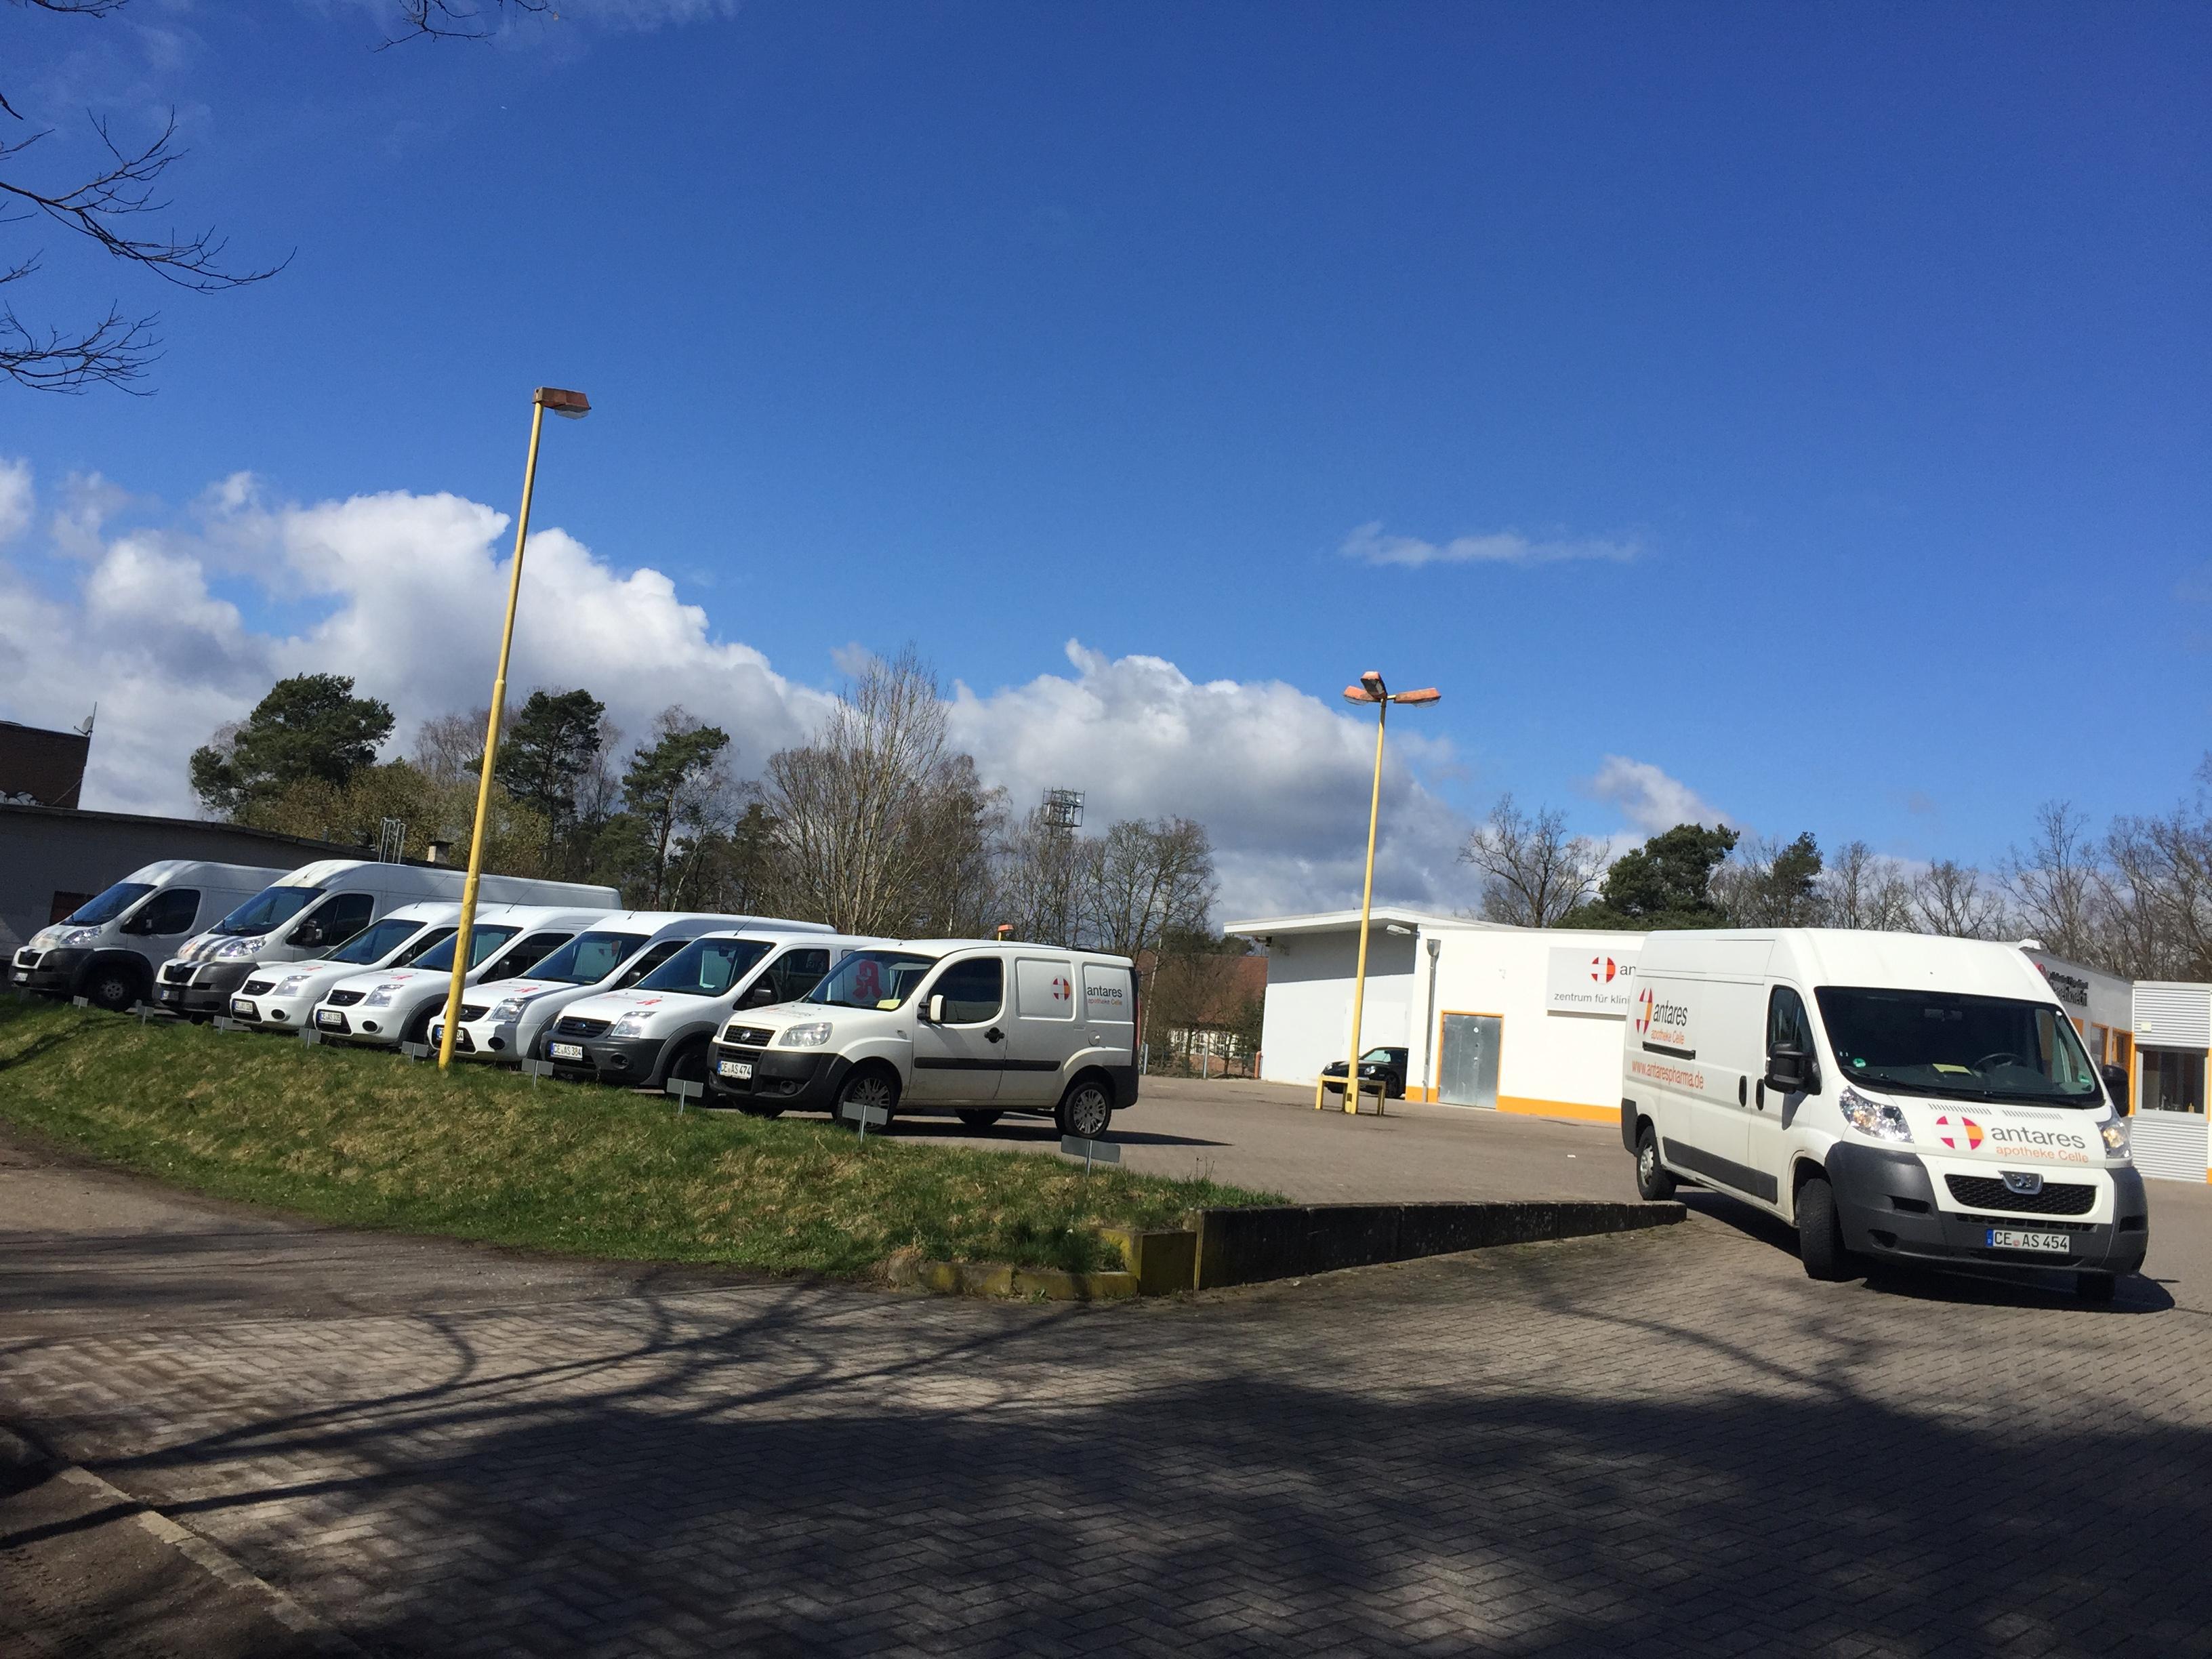 antares service GmbH